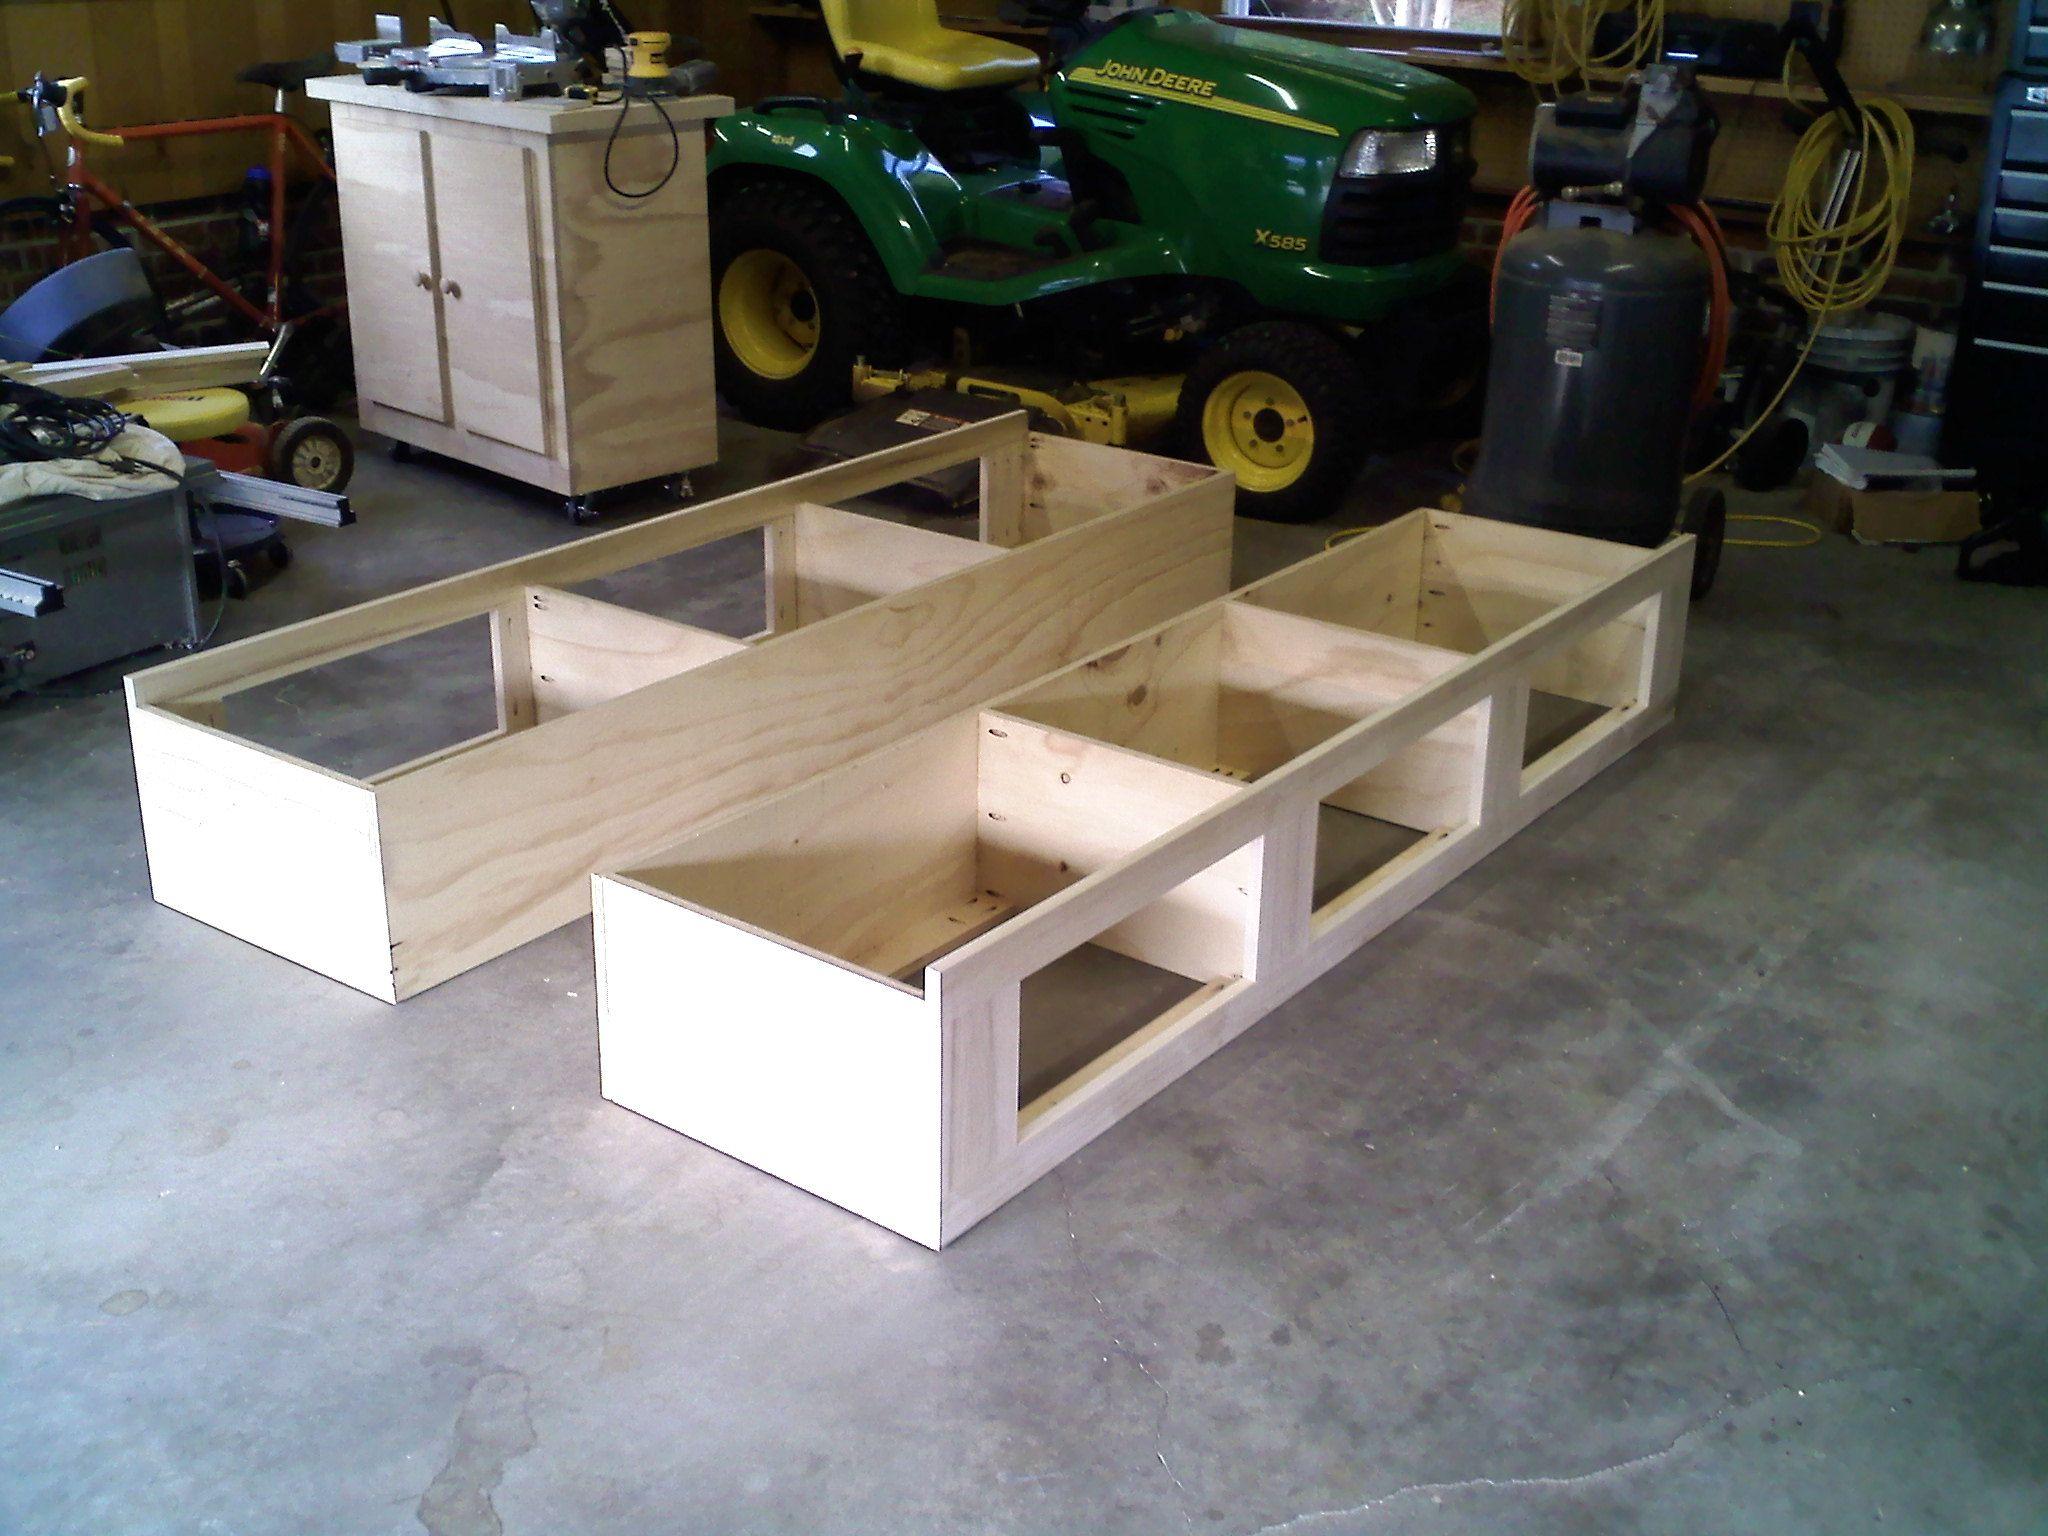 Plans for building a king size platform bed - 17 Best Images About Diy Woodworking Full Size Storage Bed Plans Pdf Download On Pinterest Woodworking Plans Diy Platform Bed And Queen Size